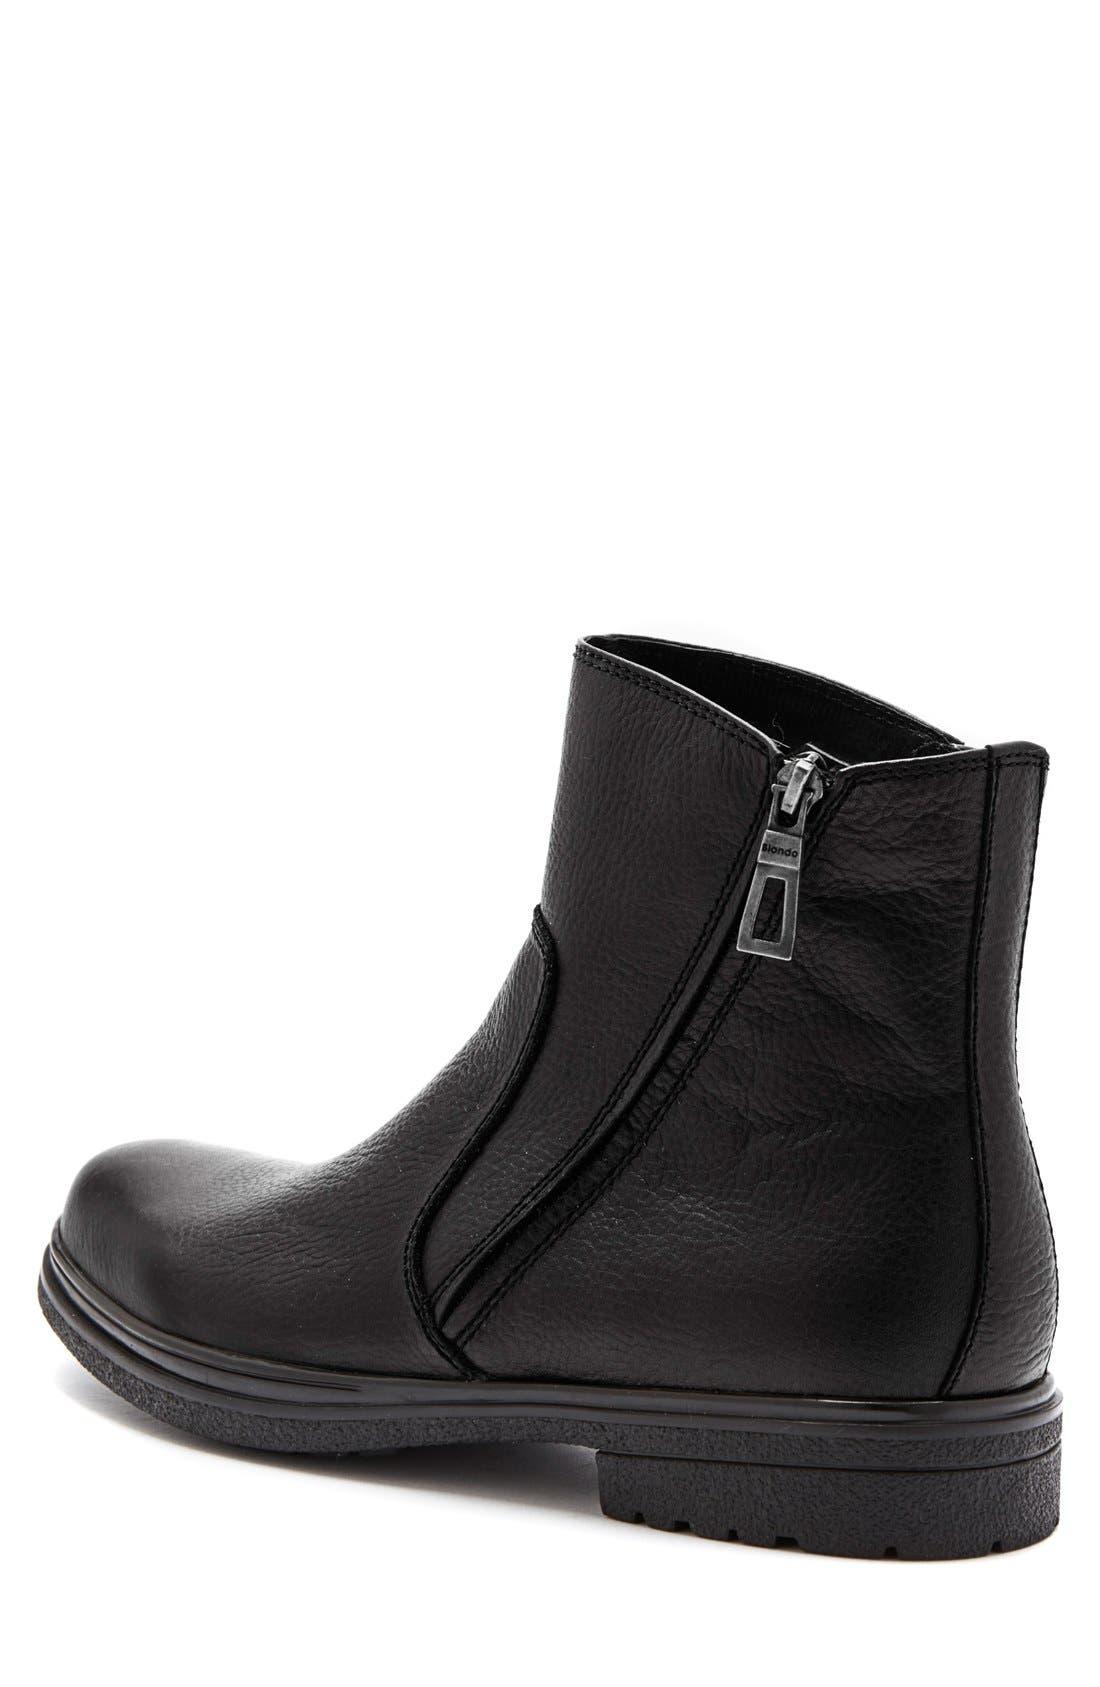 'Brawn' Waterproof Zip Boot,                             Alternate thumbnail 2, color,                             001